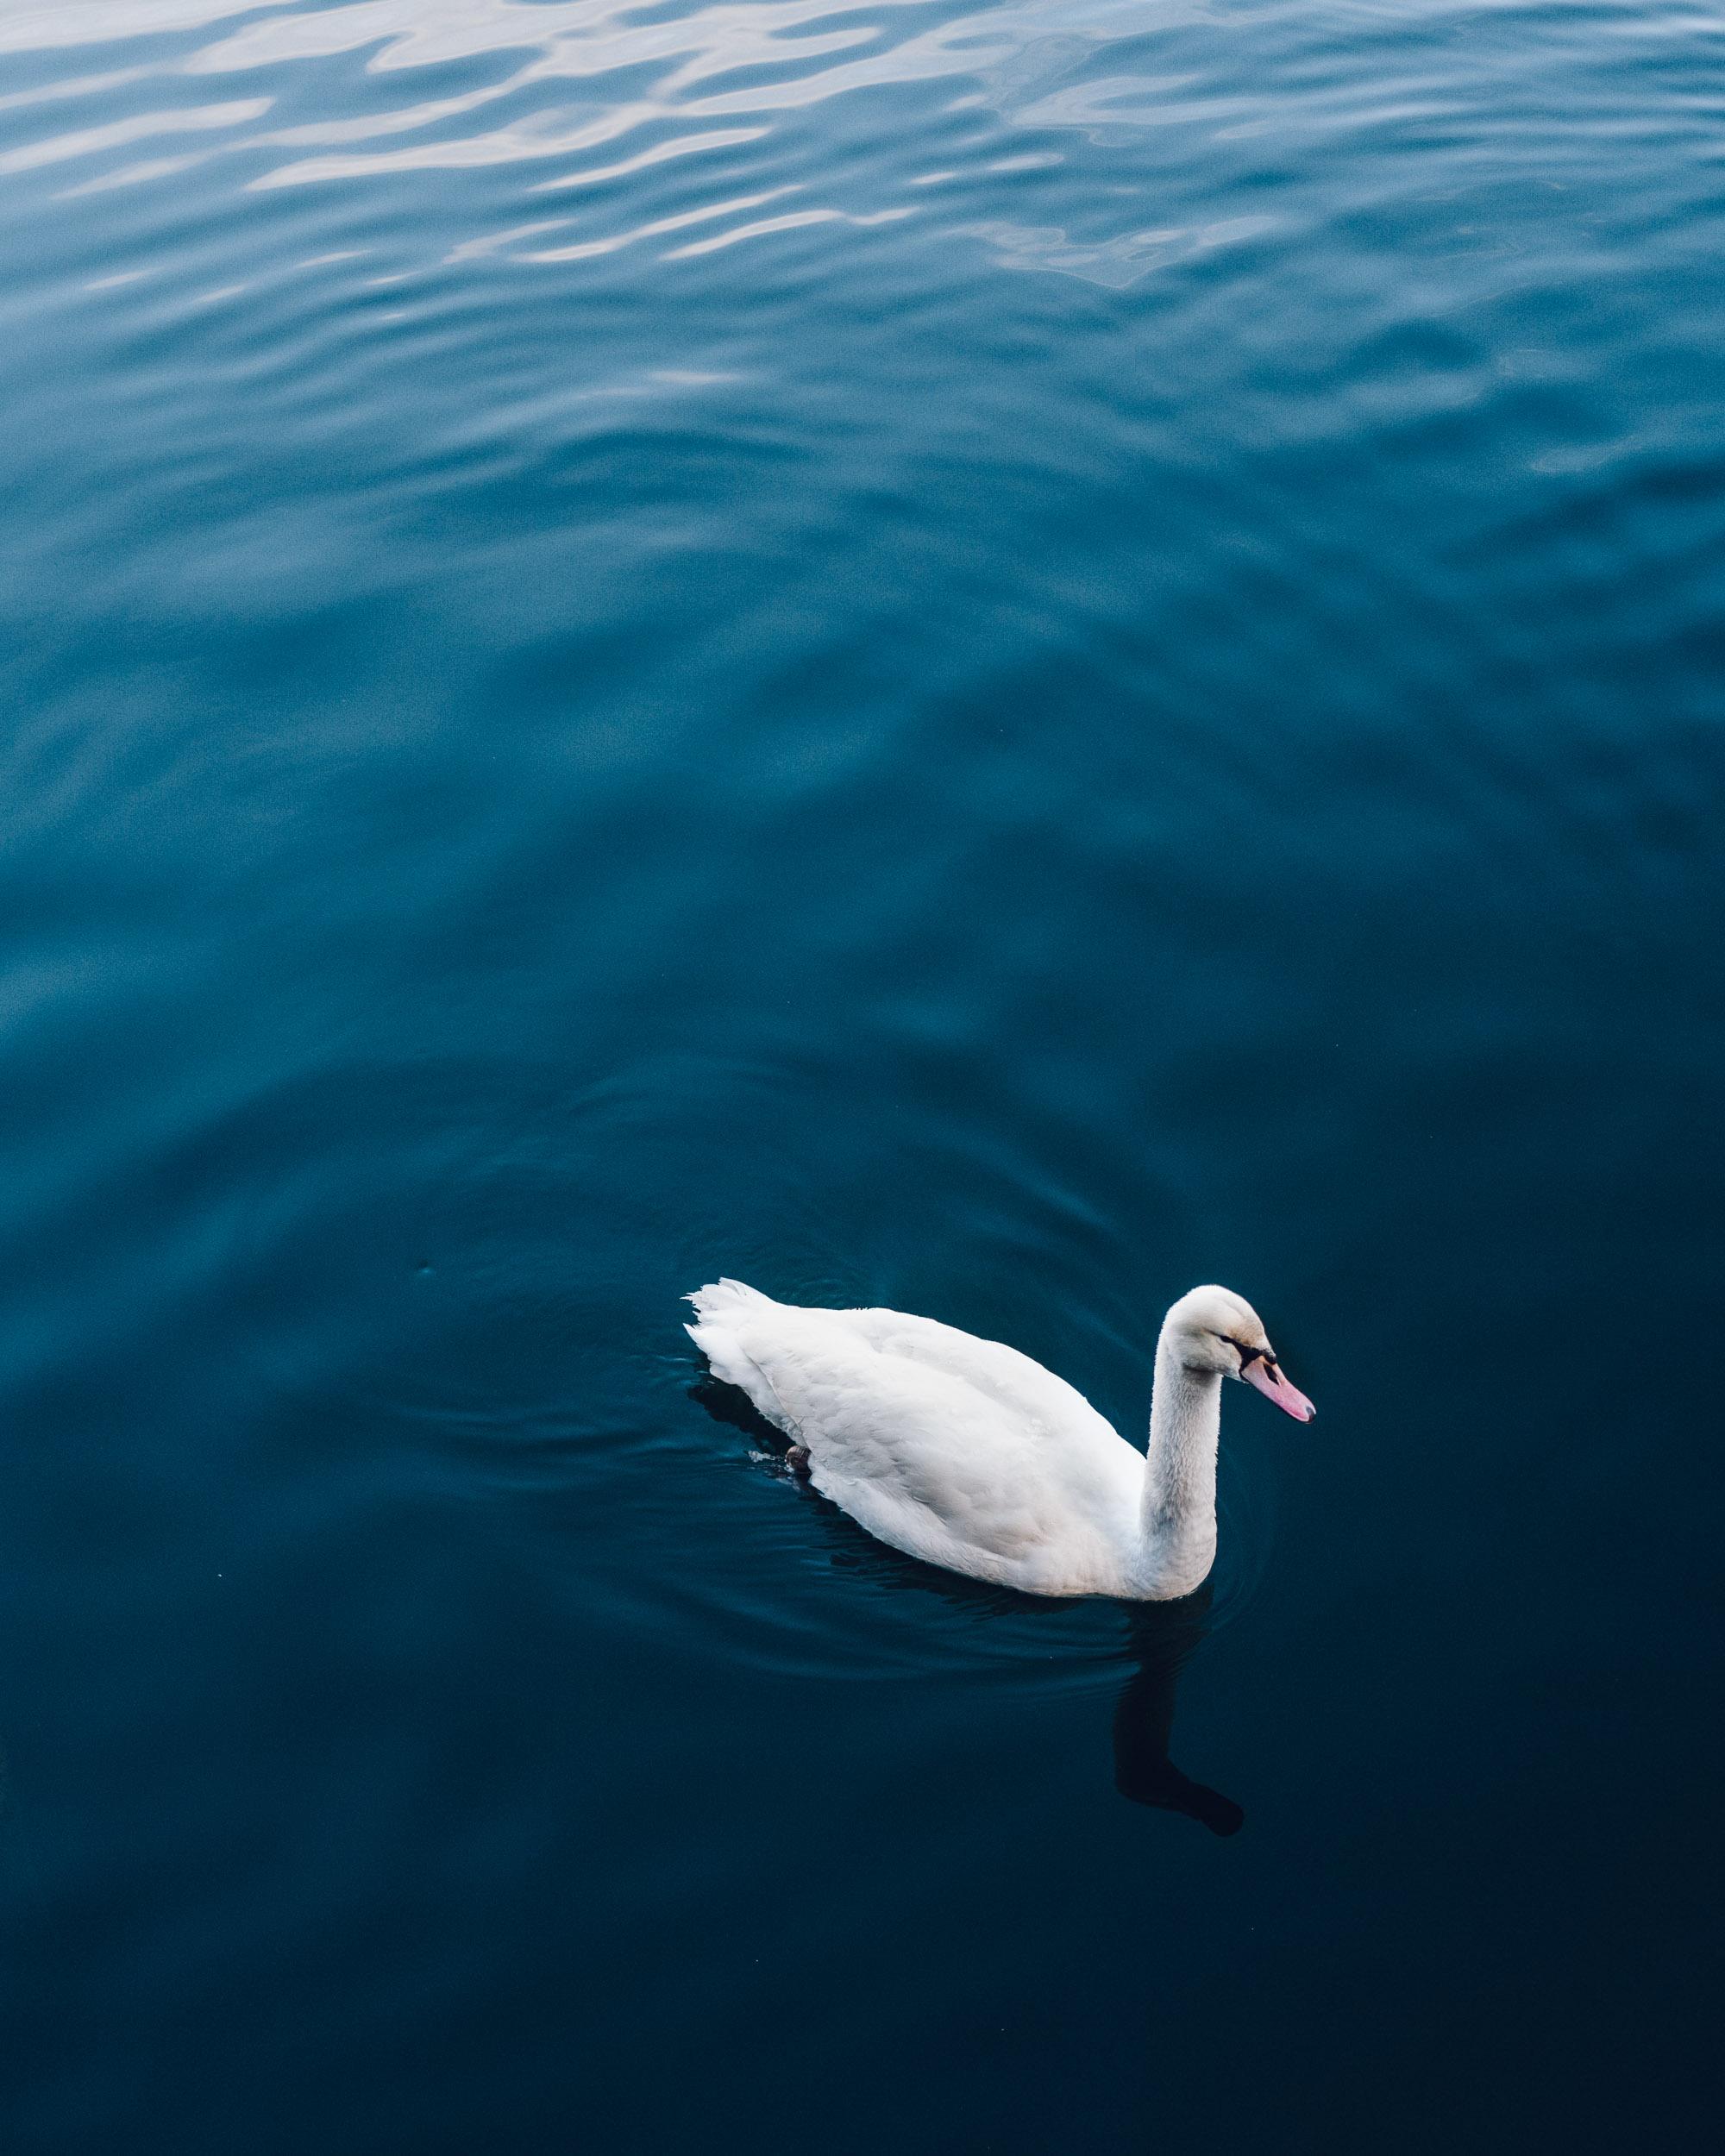 Swan at Lake Hallstatt in Austria during winter